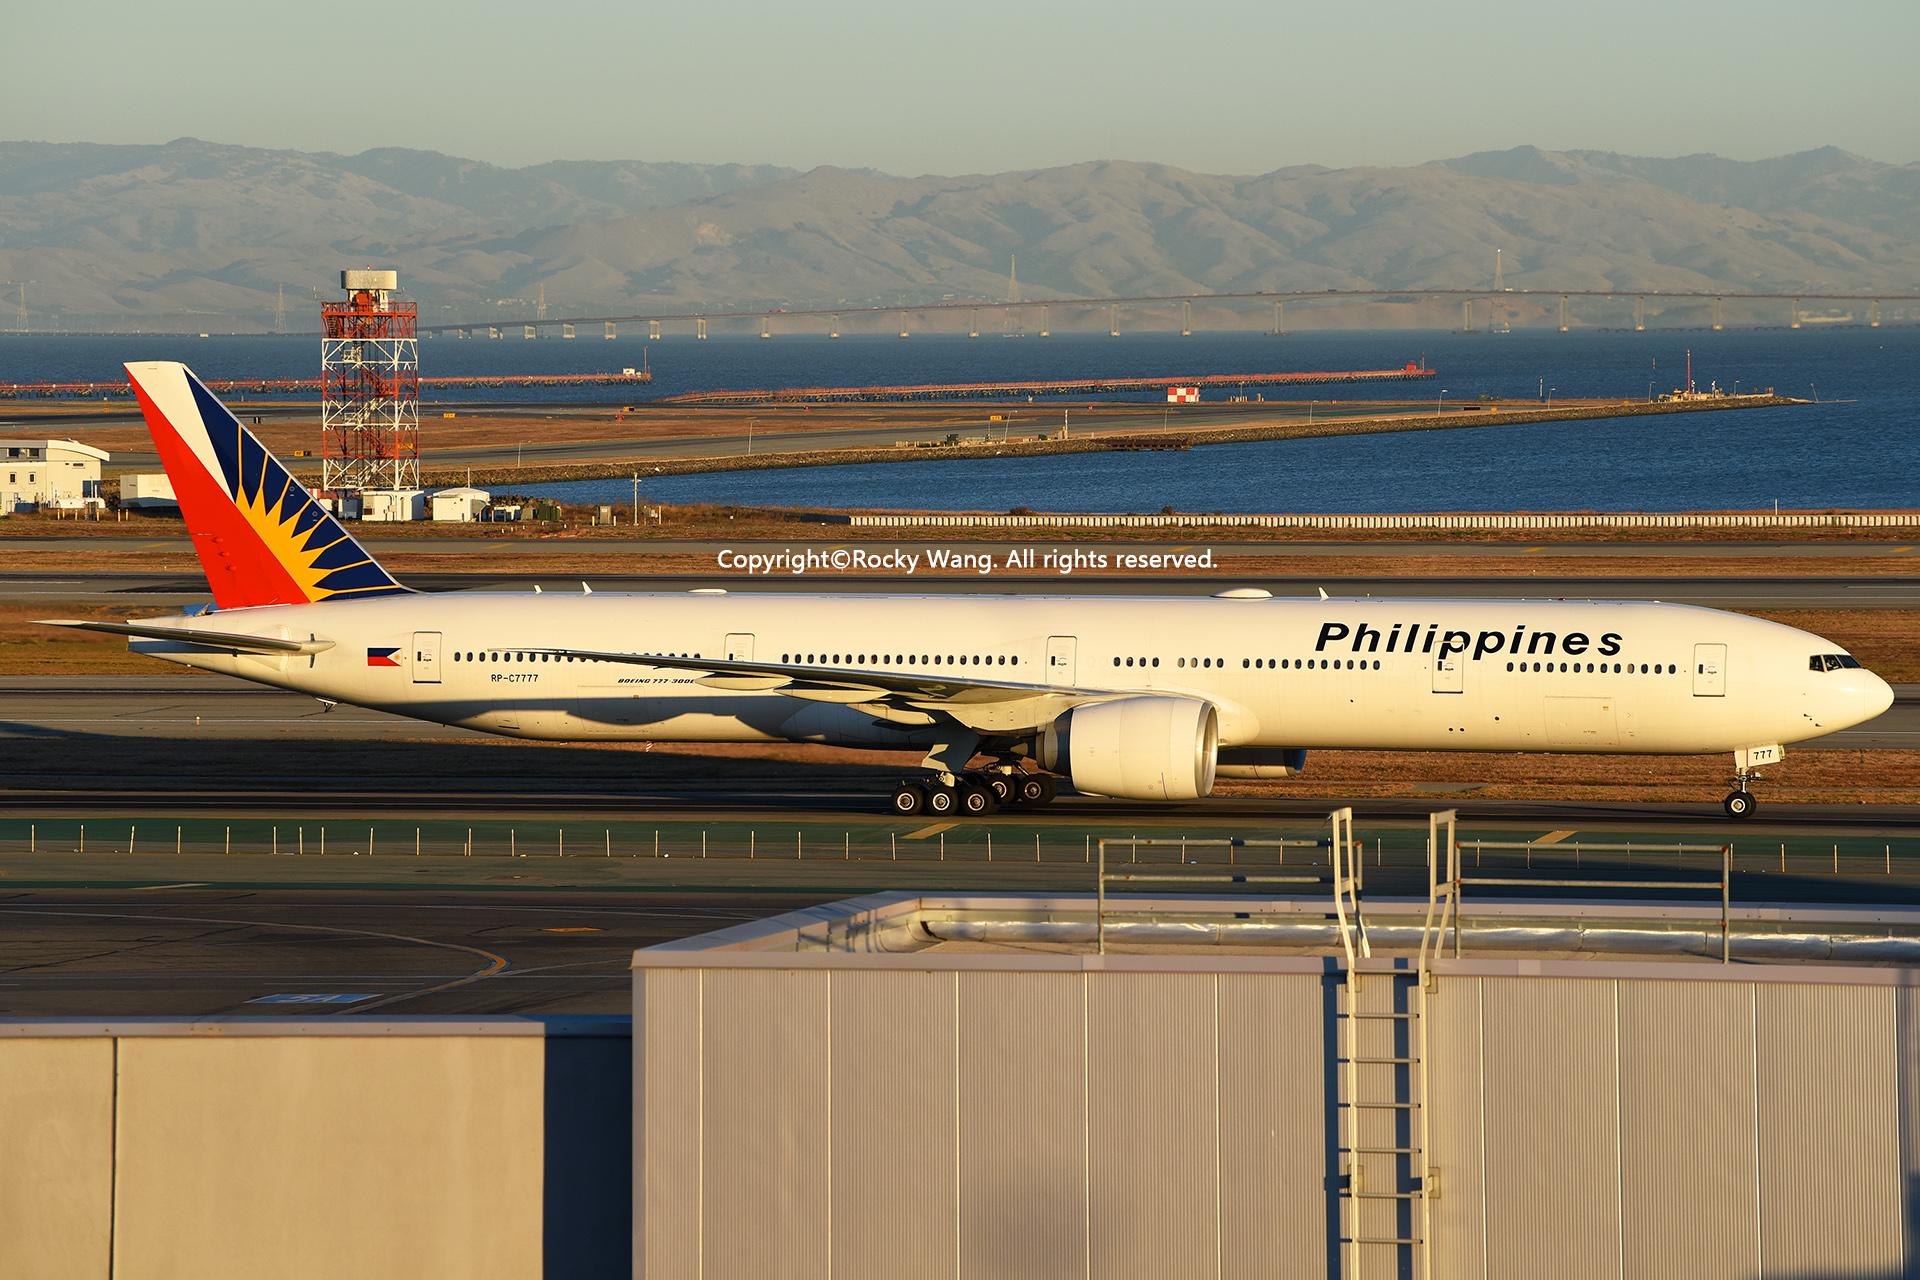 Re:[原创]居家了 批量处理老图 倾情奉献52家777 BOEING 777-36NER RP-C7777 San Francisco Int'l Airport